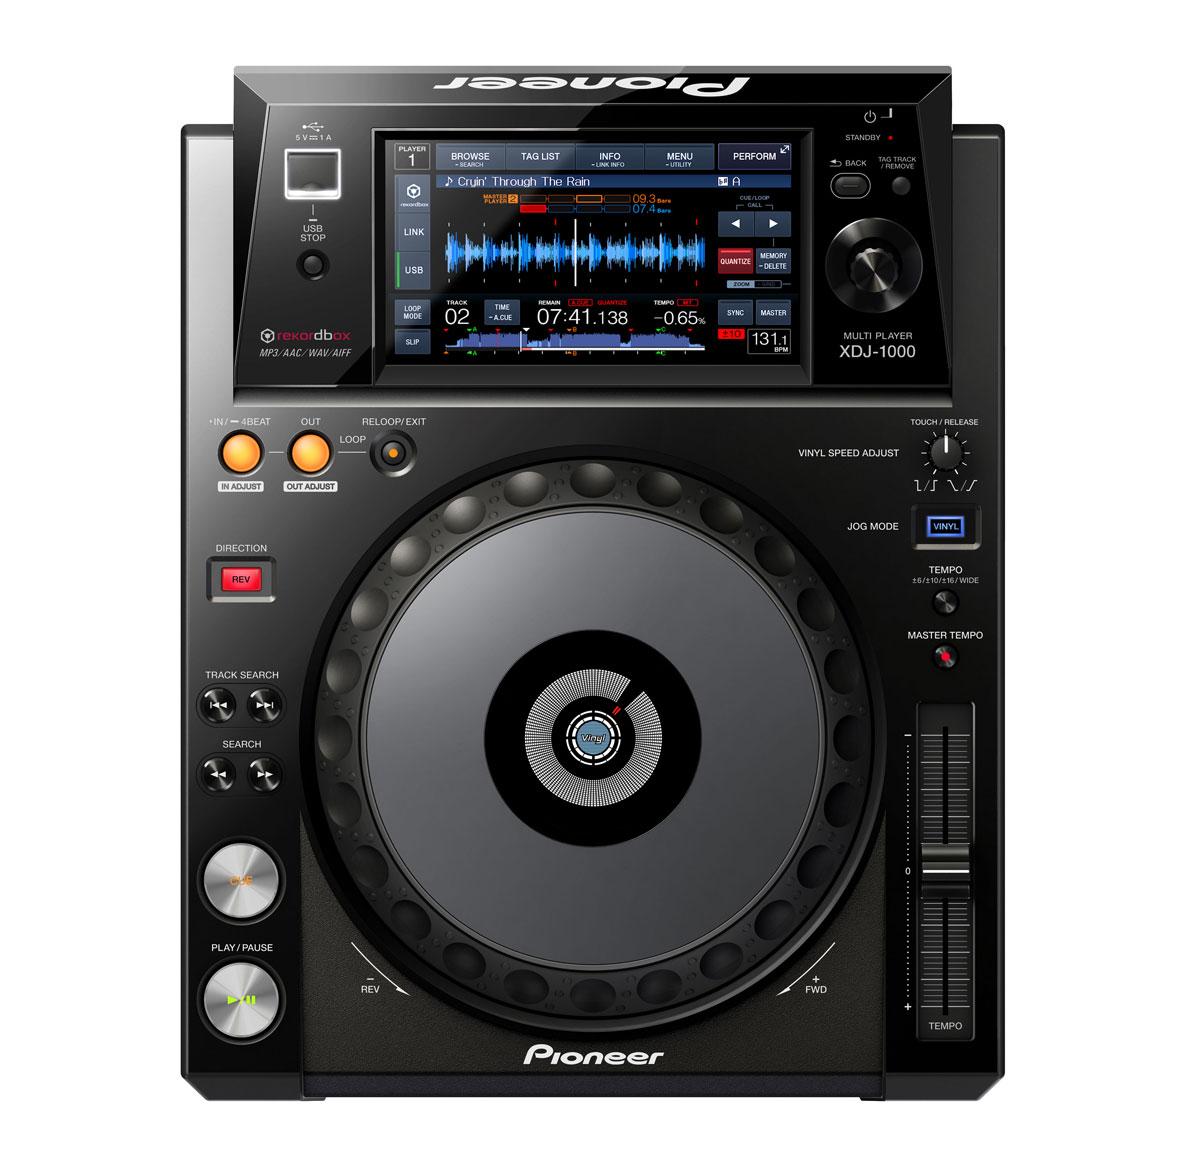 Pioneer XDJ 1000 touchscreen mediaspeler